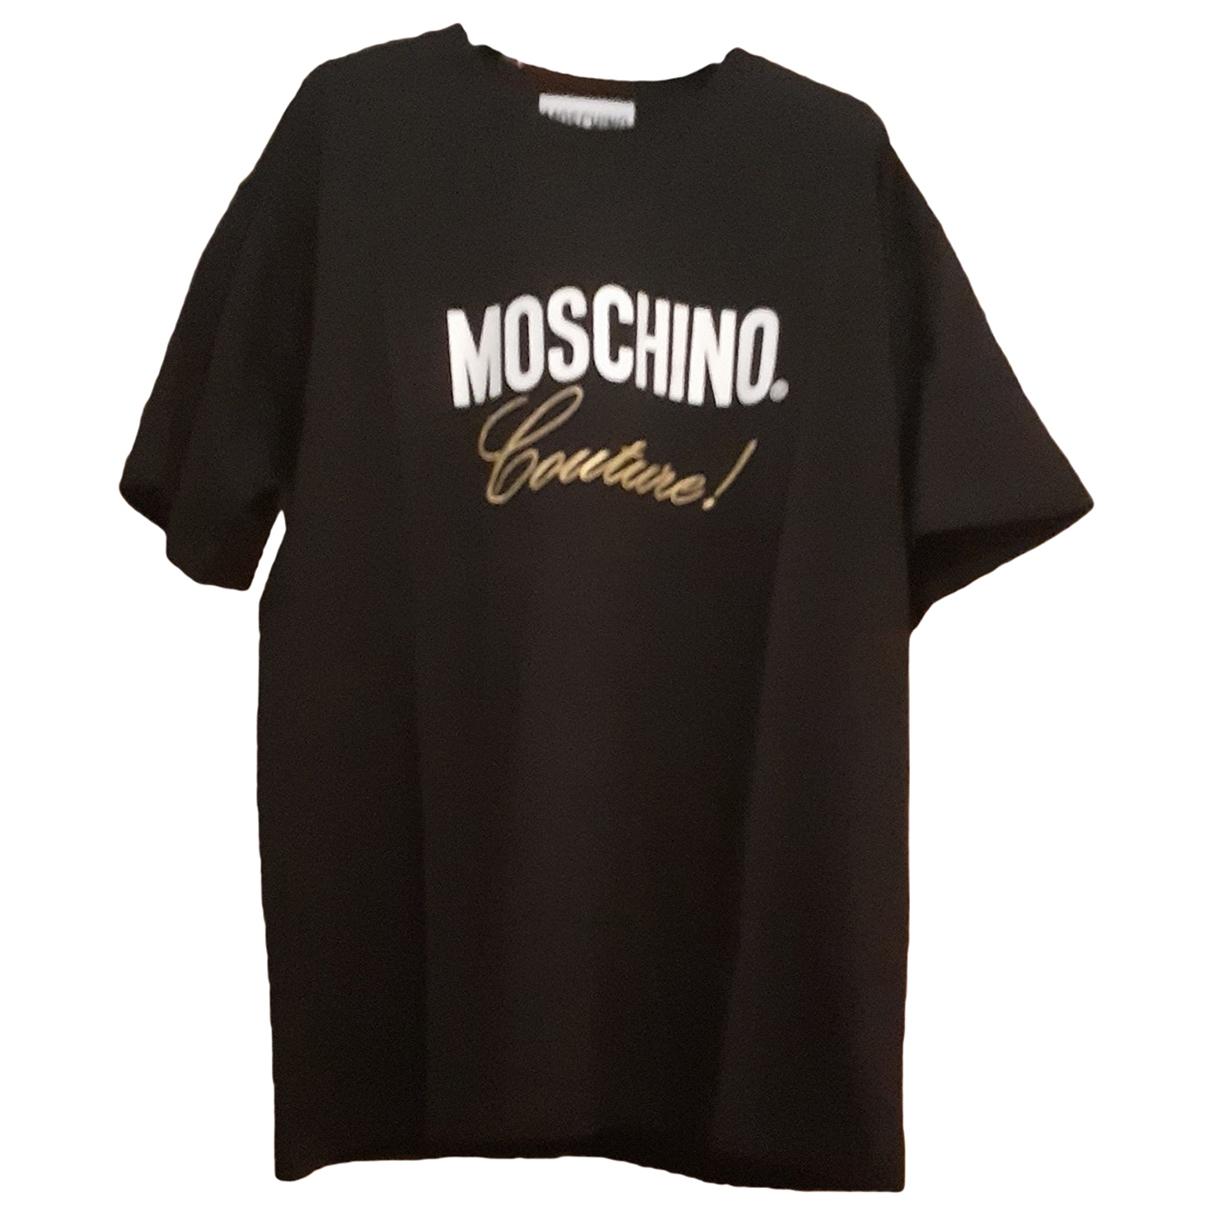 Moschino \N Black Cotton  top for Women S International